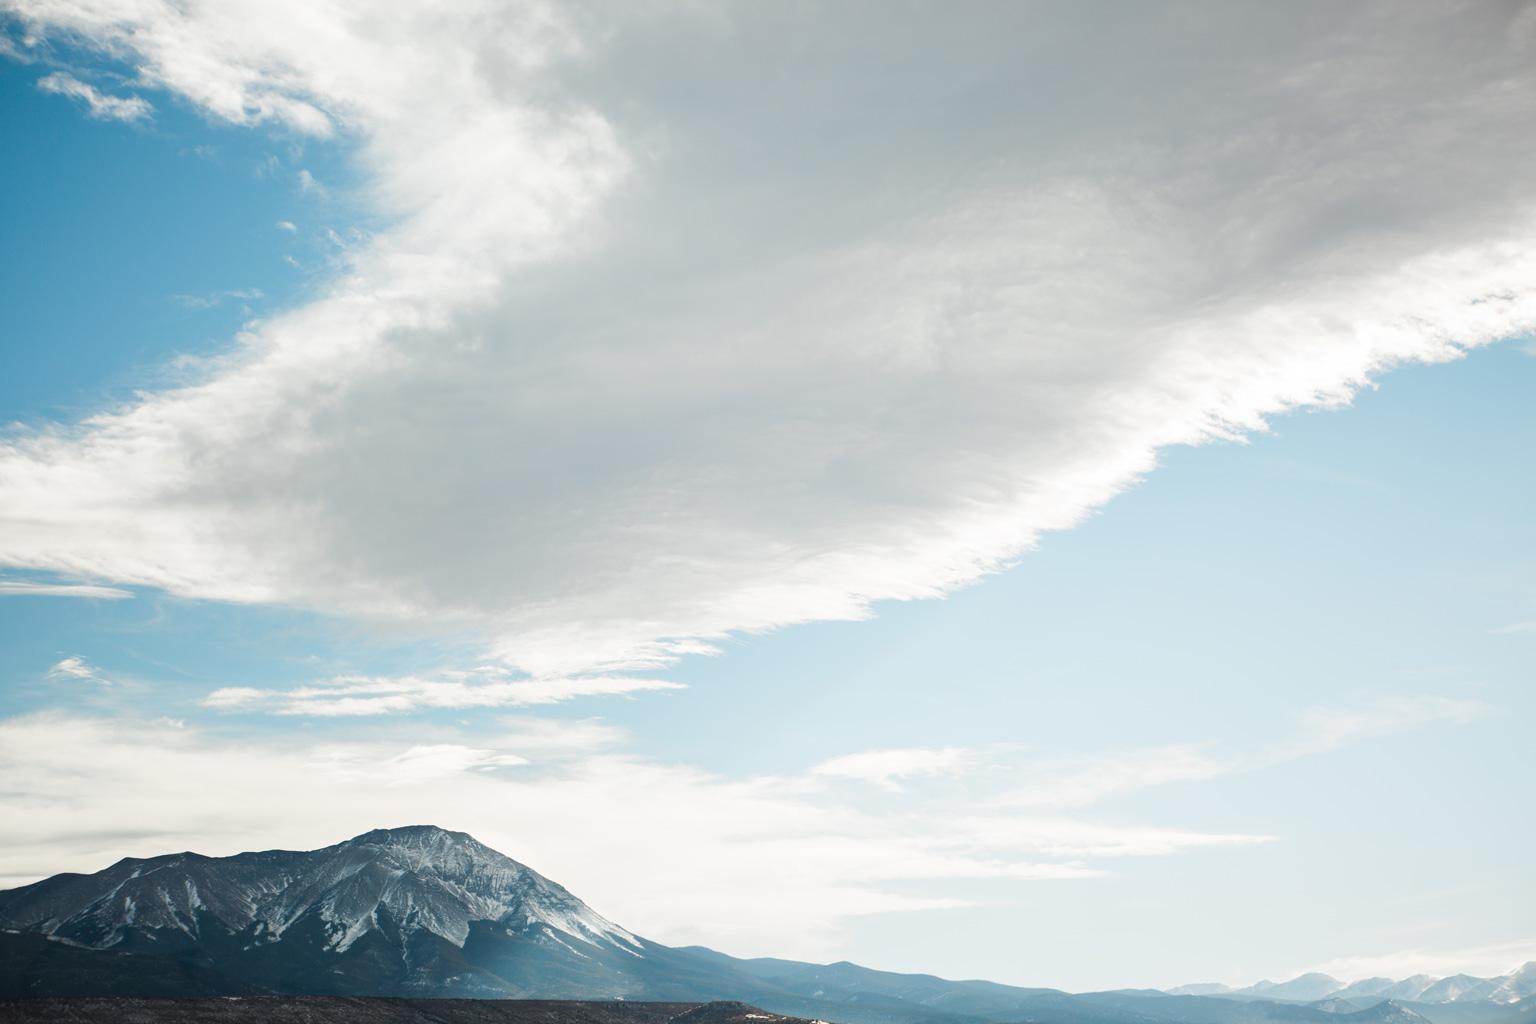 CindyGiovagnoli_Great_Sand_Dunes_Zion_National_Park_Horseshoe_Bend_Truck_Camping_Toyota_The_Narrows_roadtrip_Utah_Colorado-002.jpg